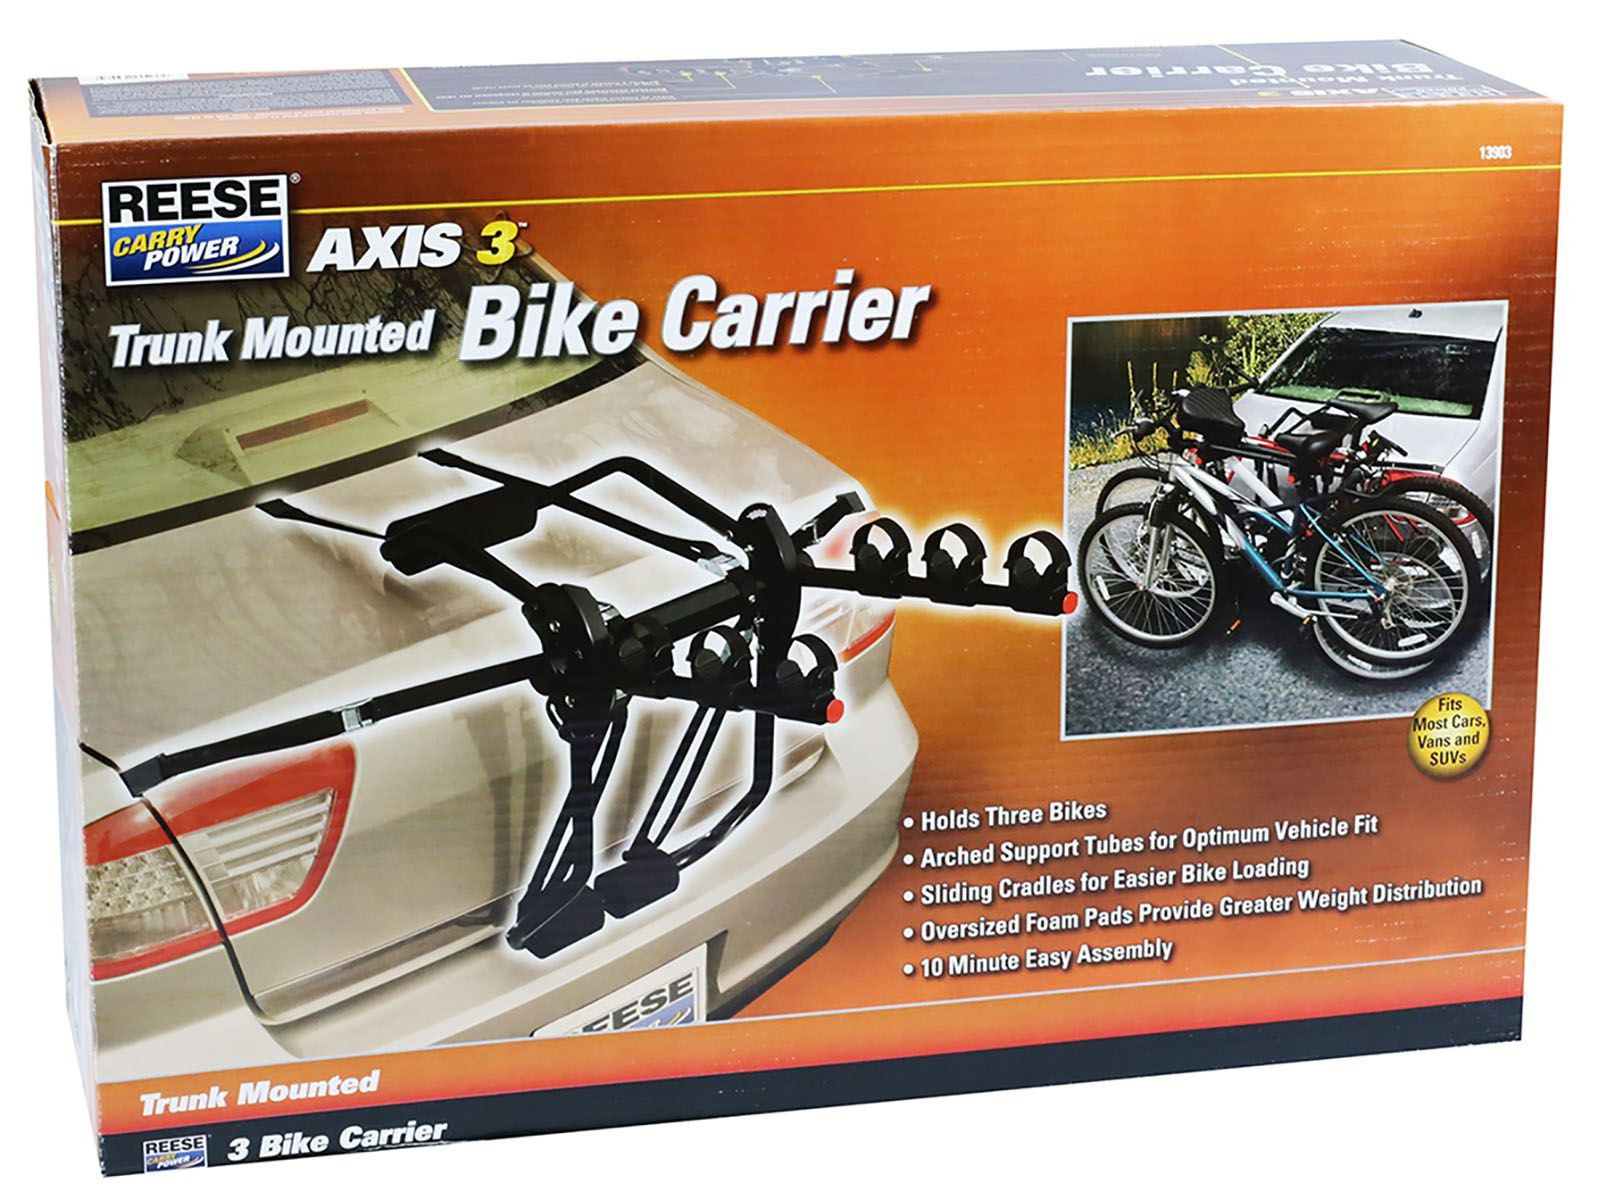 Suporte De Bicicletas Transbike Para Porta Malas Até 3 Bikes Reese